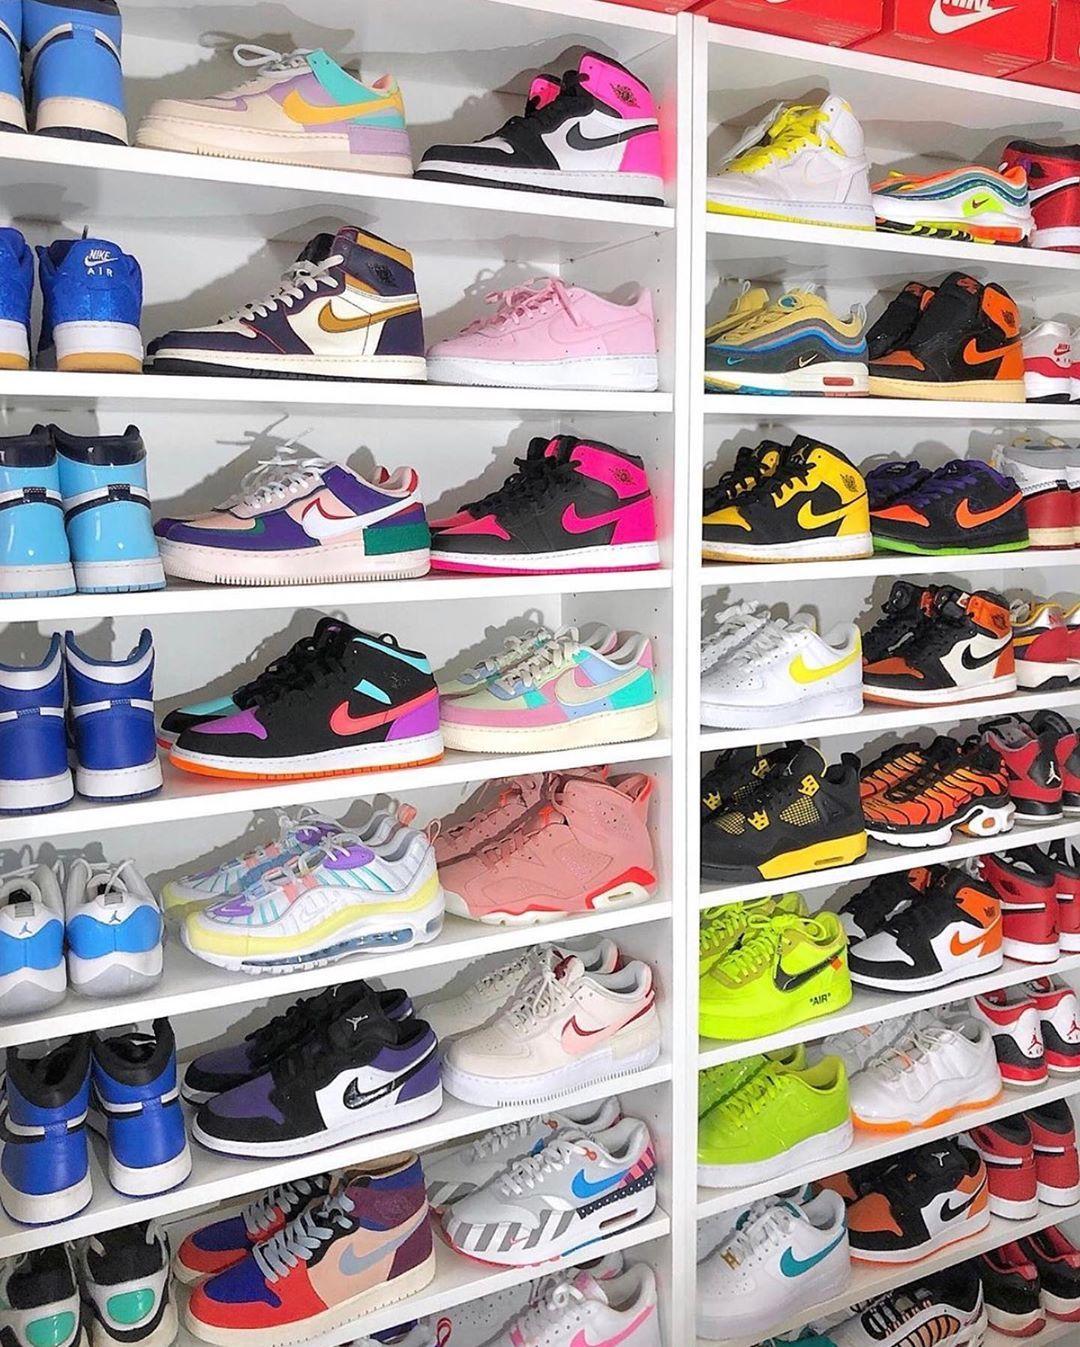 Pin by Eric J. Brown on Nice kicks Sneakerhead outfits